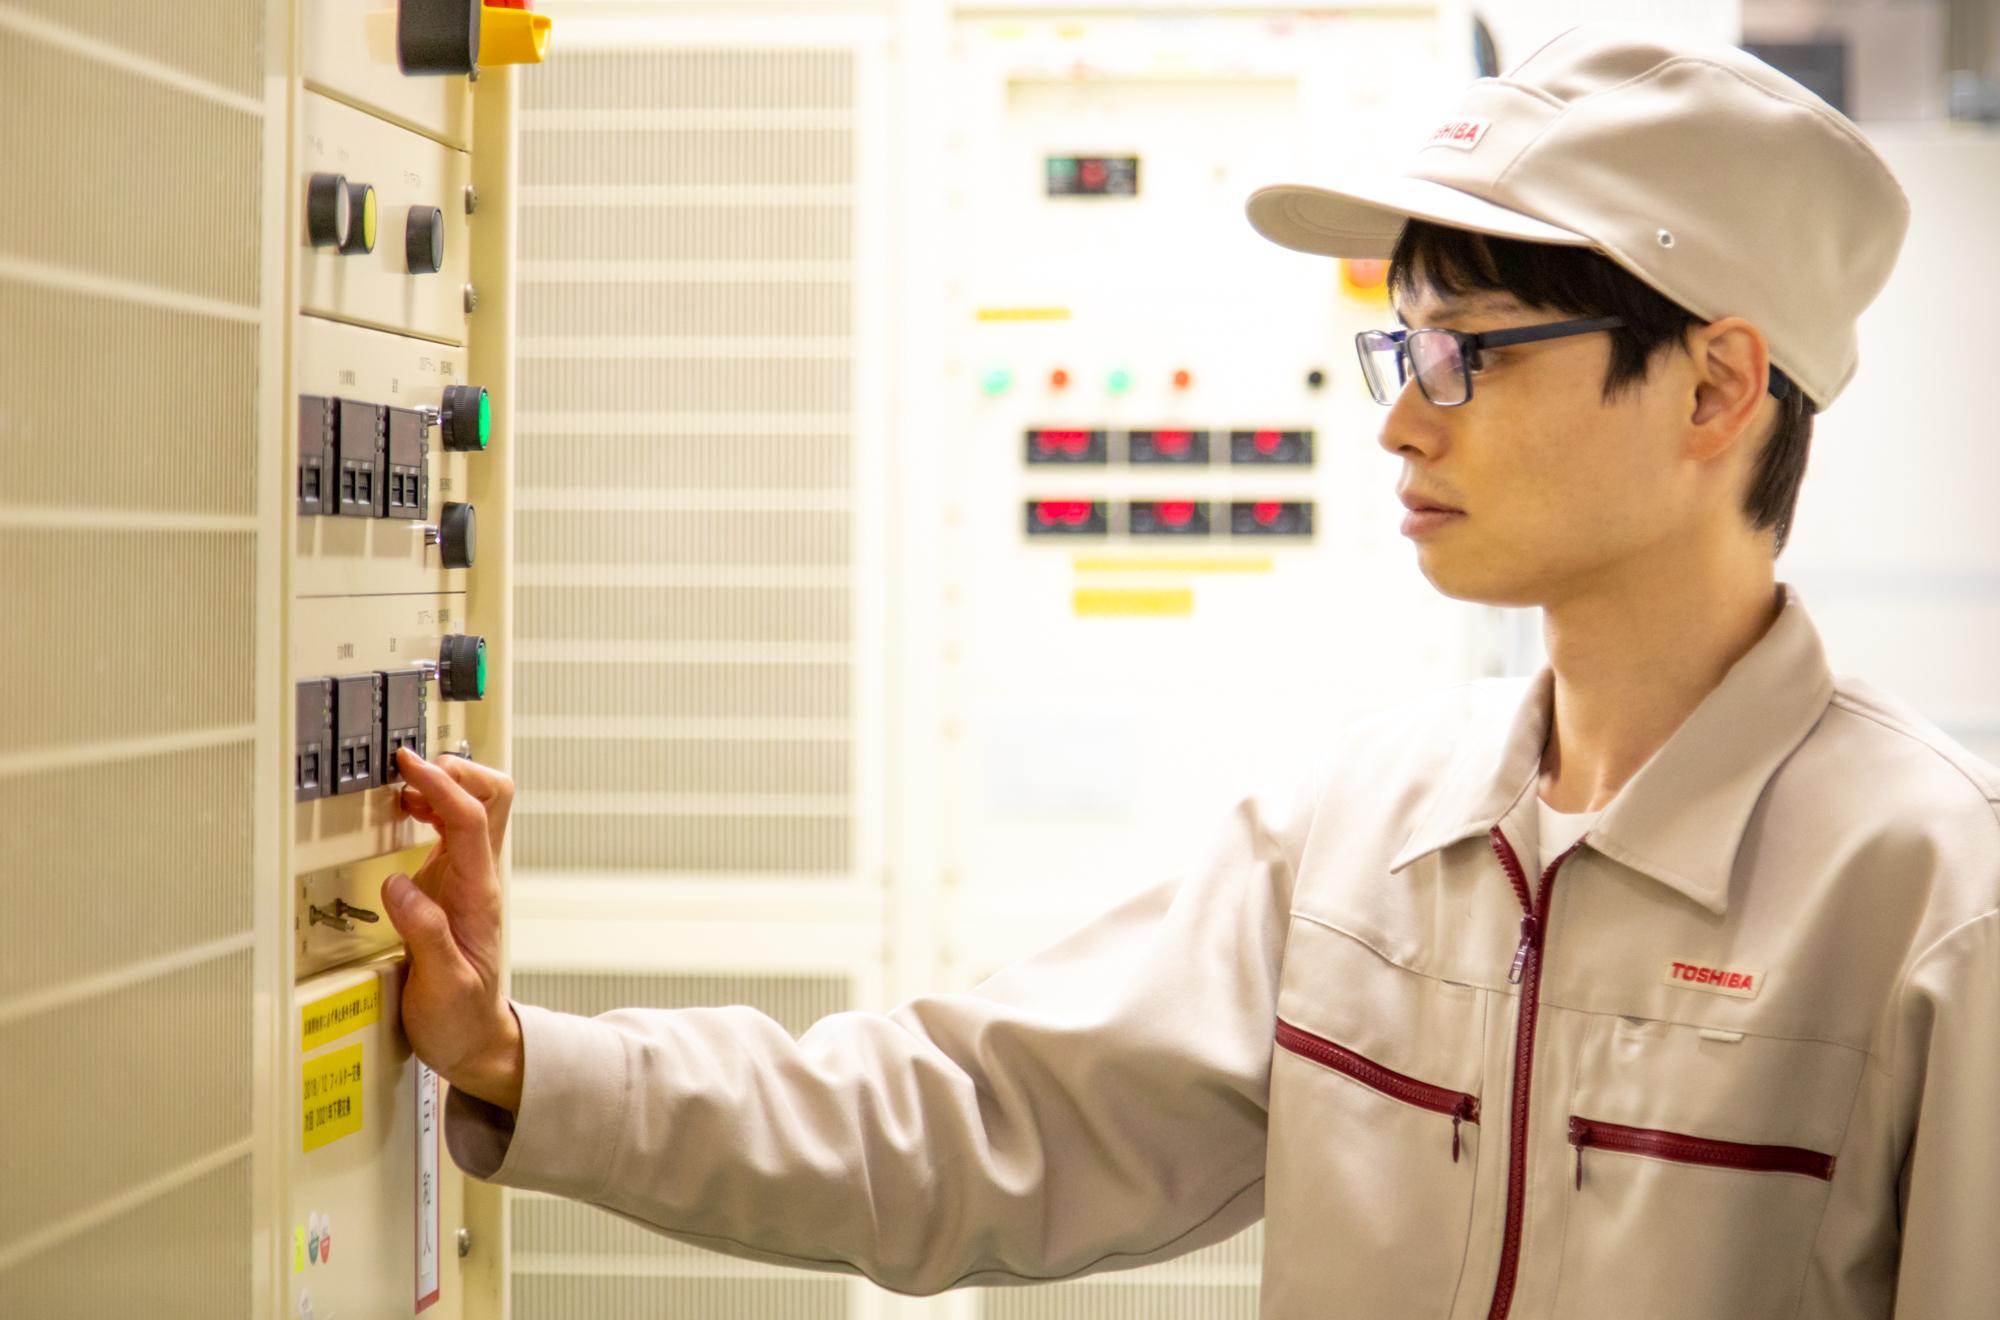 Masahiro Kurosu, Battery System Development Group 1, Battery System Development Department, Battery Division, Toshiba Corporation(2)